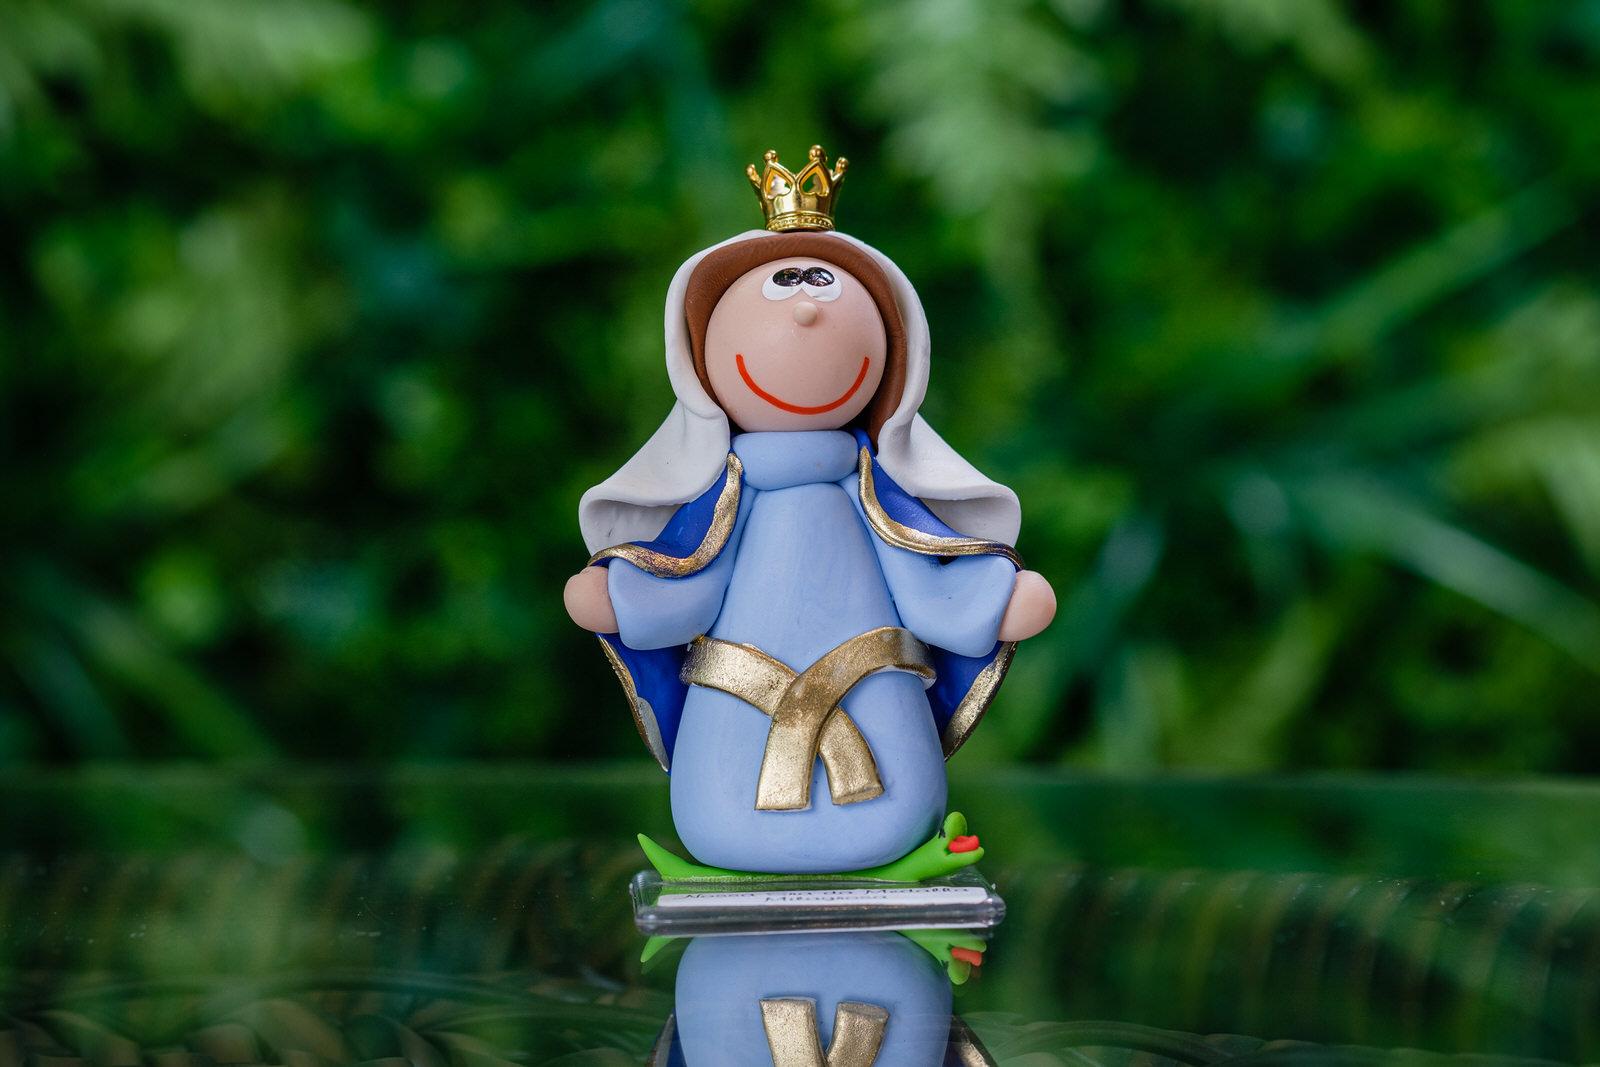 Nossa Senhora da Medalha Milagrosa em Biscuit